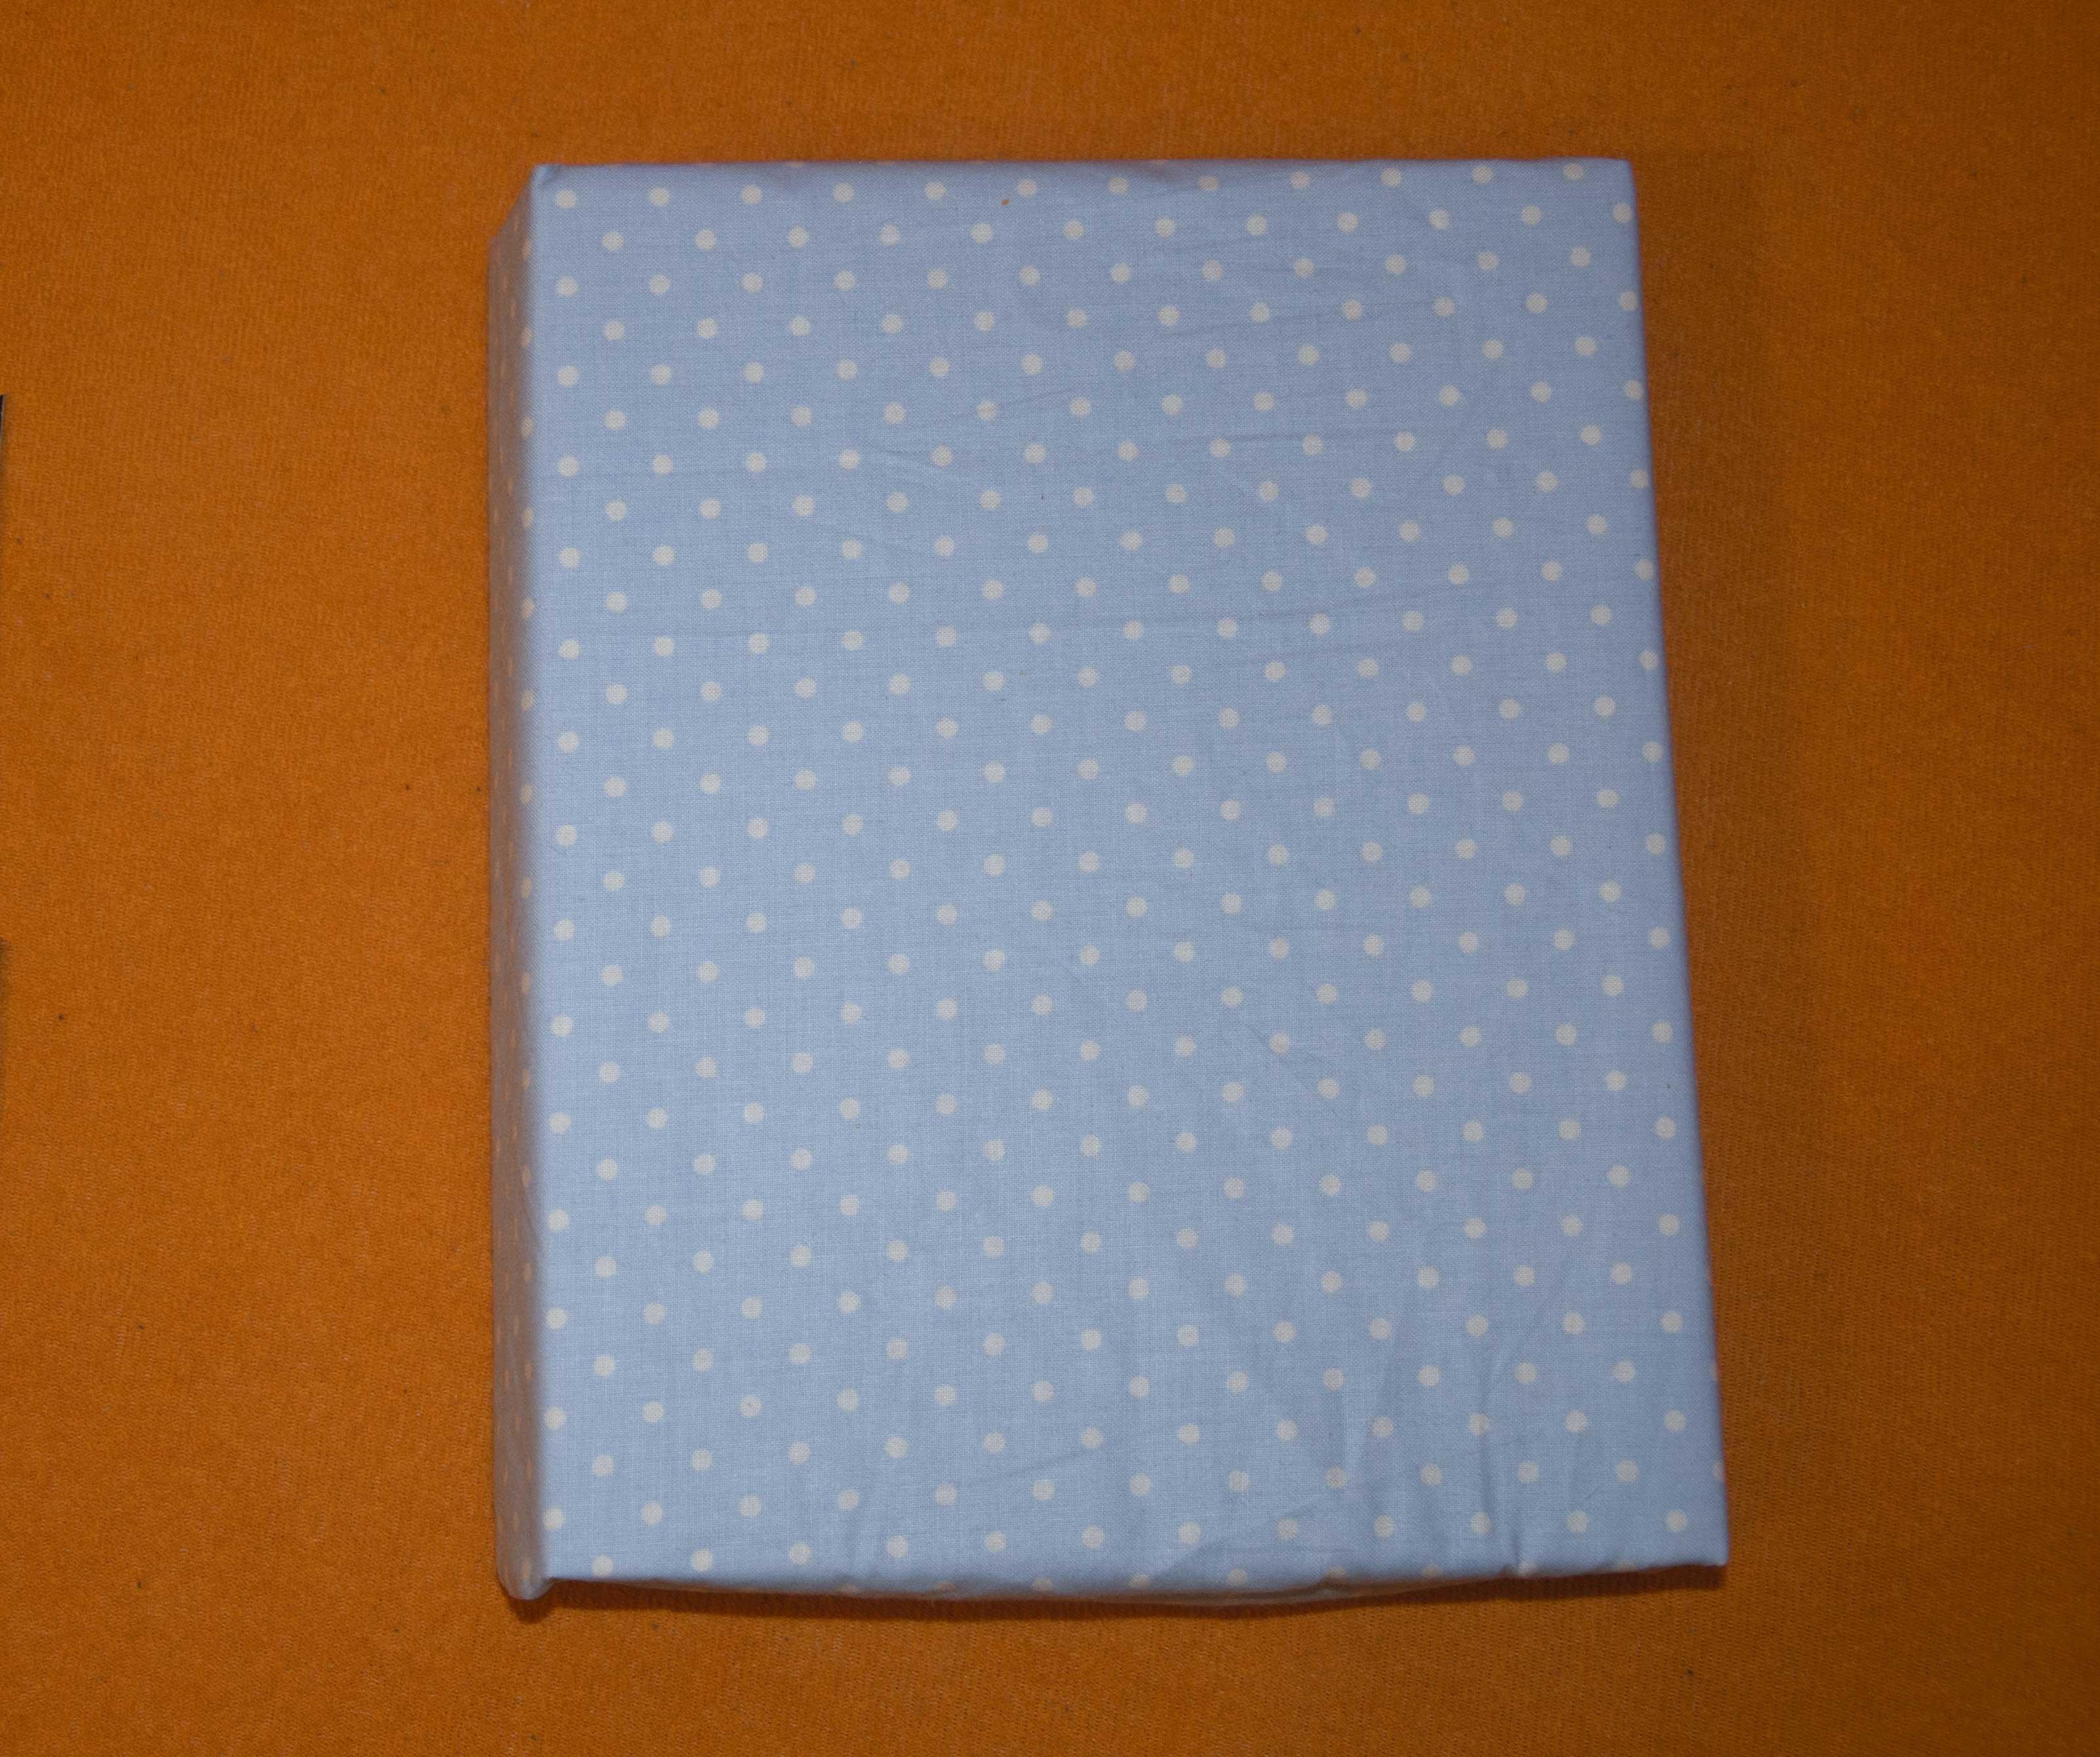 Bavln�n� prost�radlo 120x60 cm modr� s b�l�mi v�t��mi punt�ky